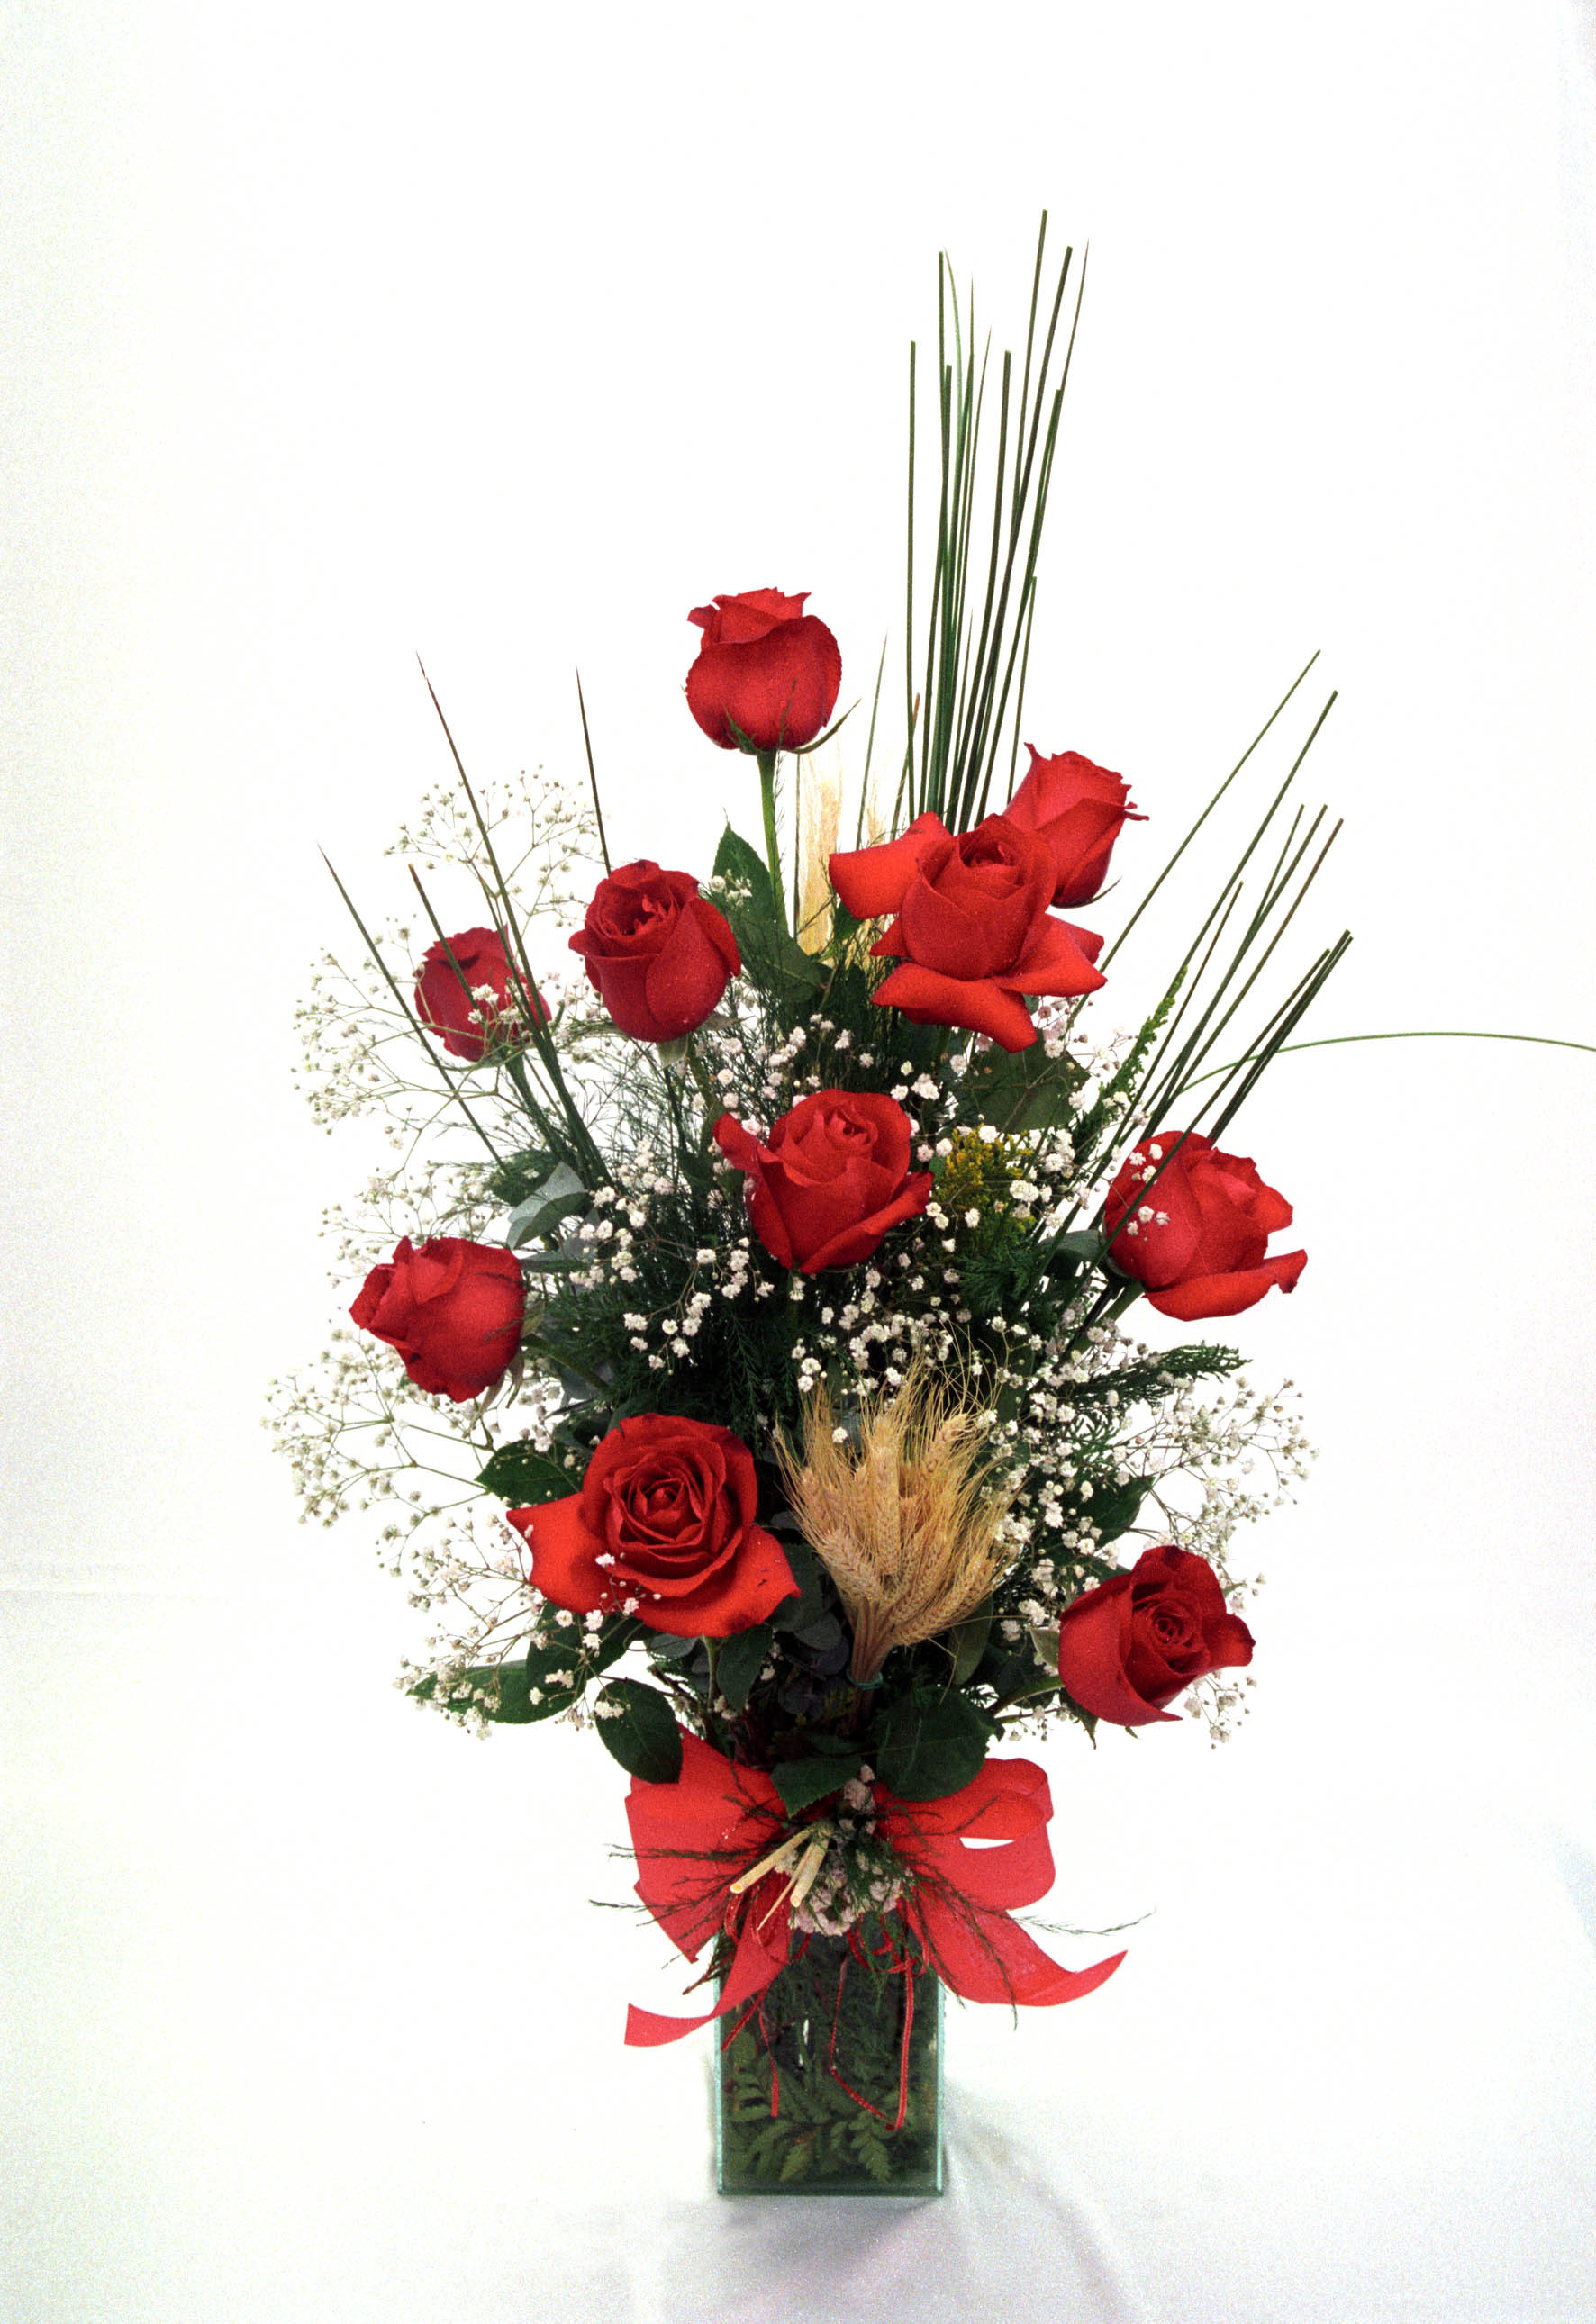 Bouquet Rosas Colombianas no Vidro - Visão Panorâmica